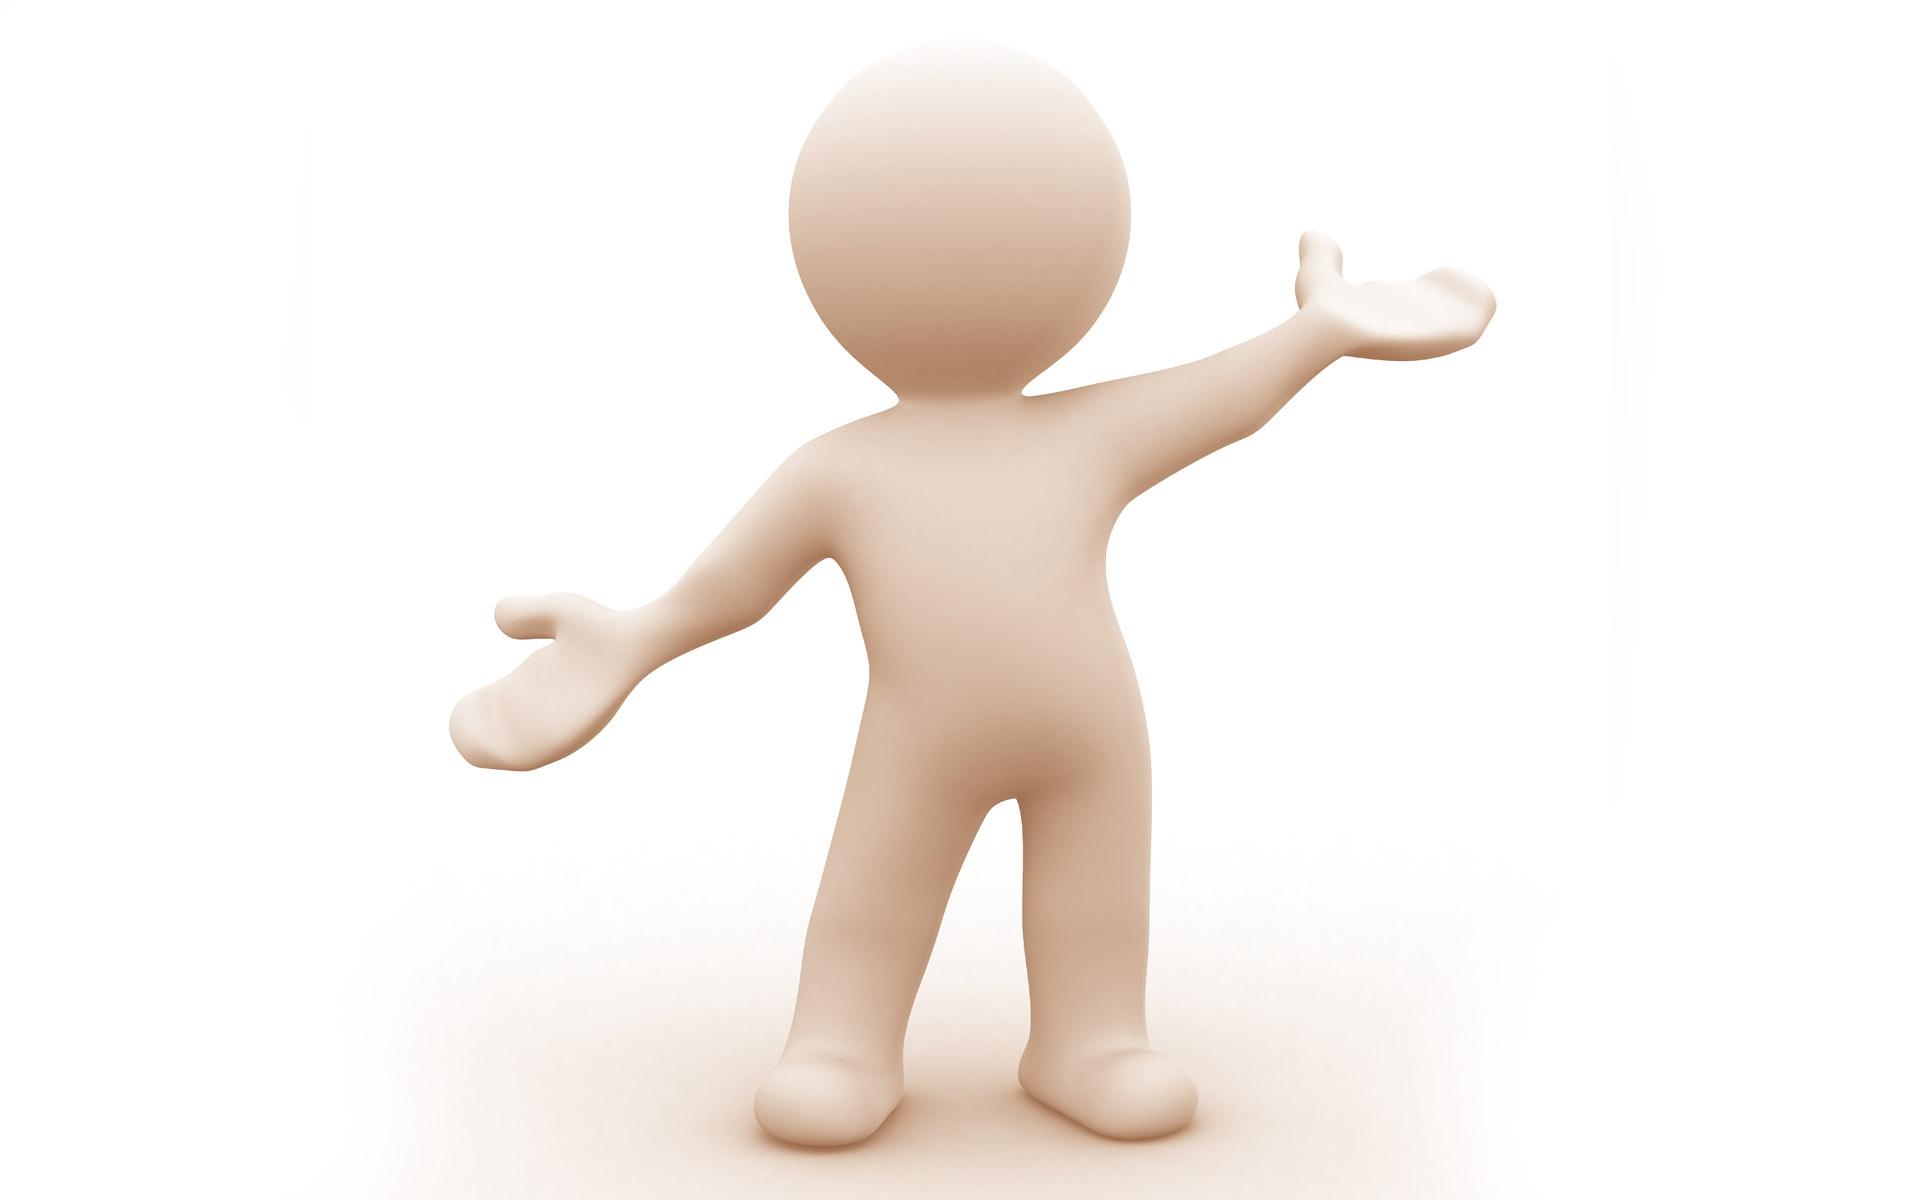 3d stick man clipart freeuse stock Human Figure Clipart | Free download best Human Figure Clipart on ... freeuse stock